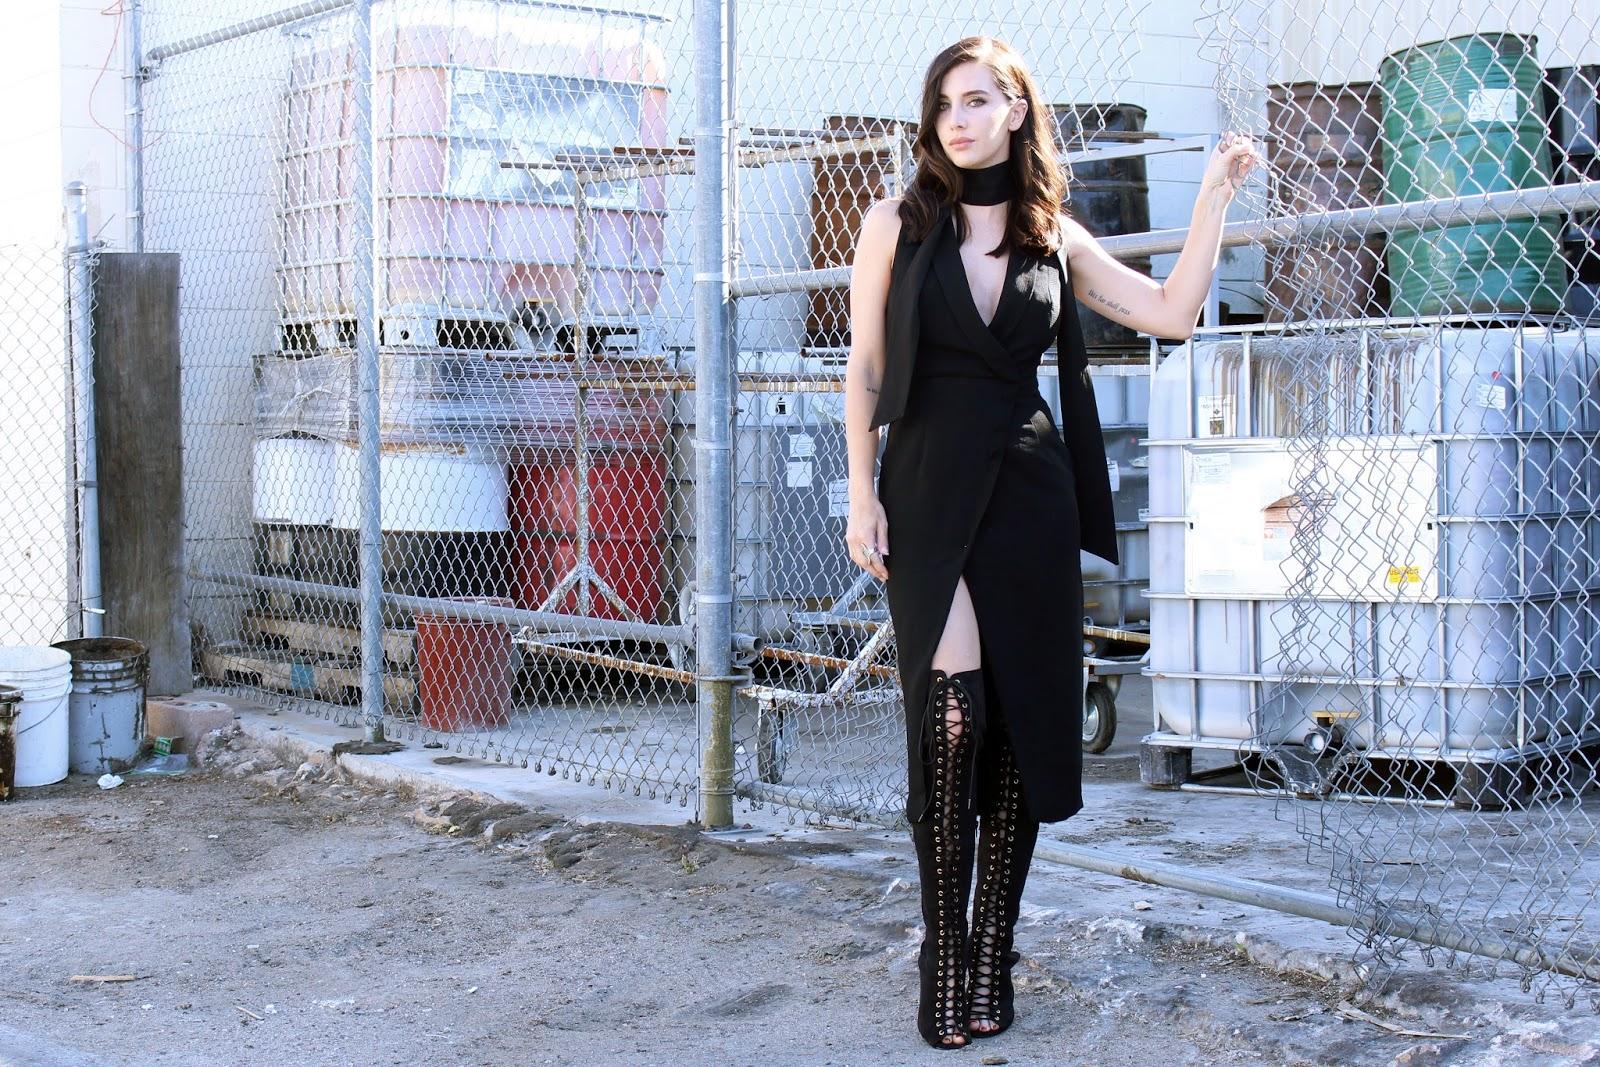 1-modna-letna-inspiracija-kako-da-go-nosite-fustanot-na-preklop-www.kafepauza.mk_